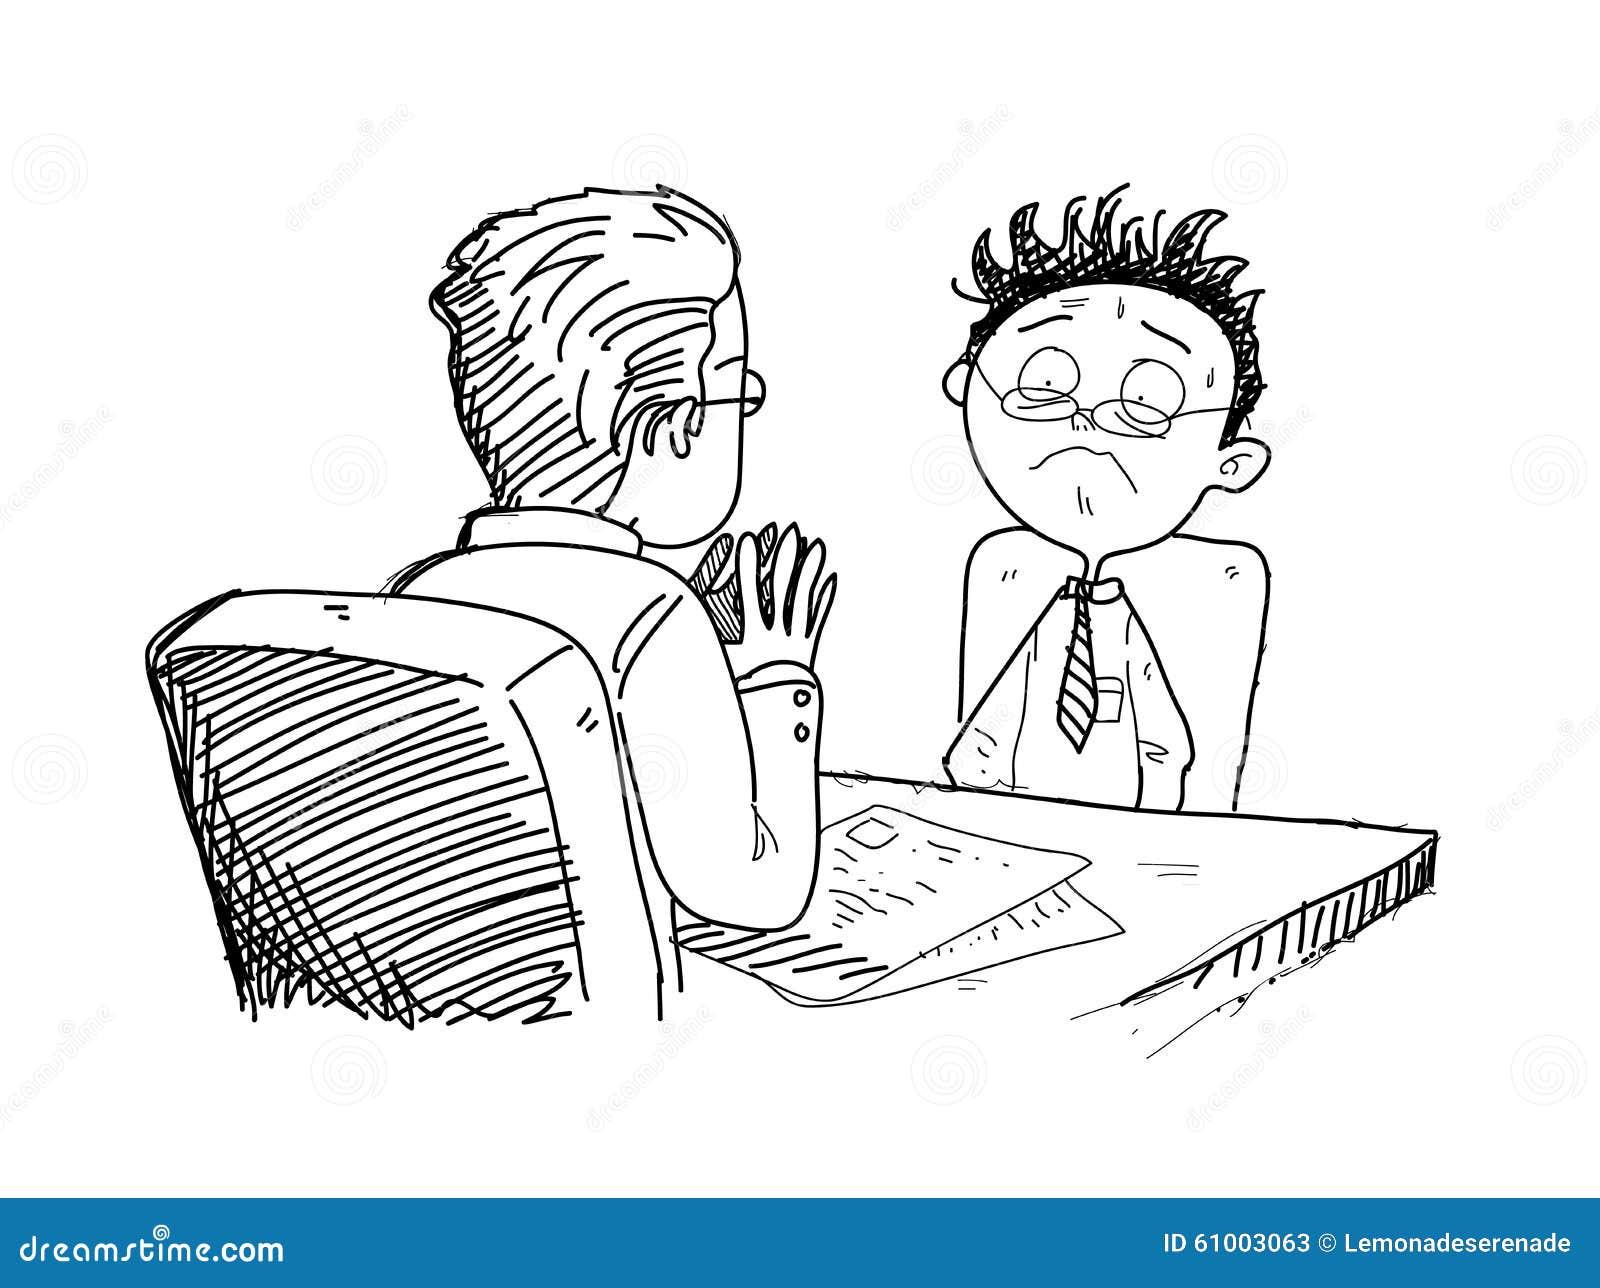 Vector Drawing Lines Job : Job interview stock vector image